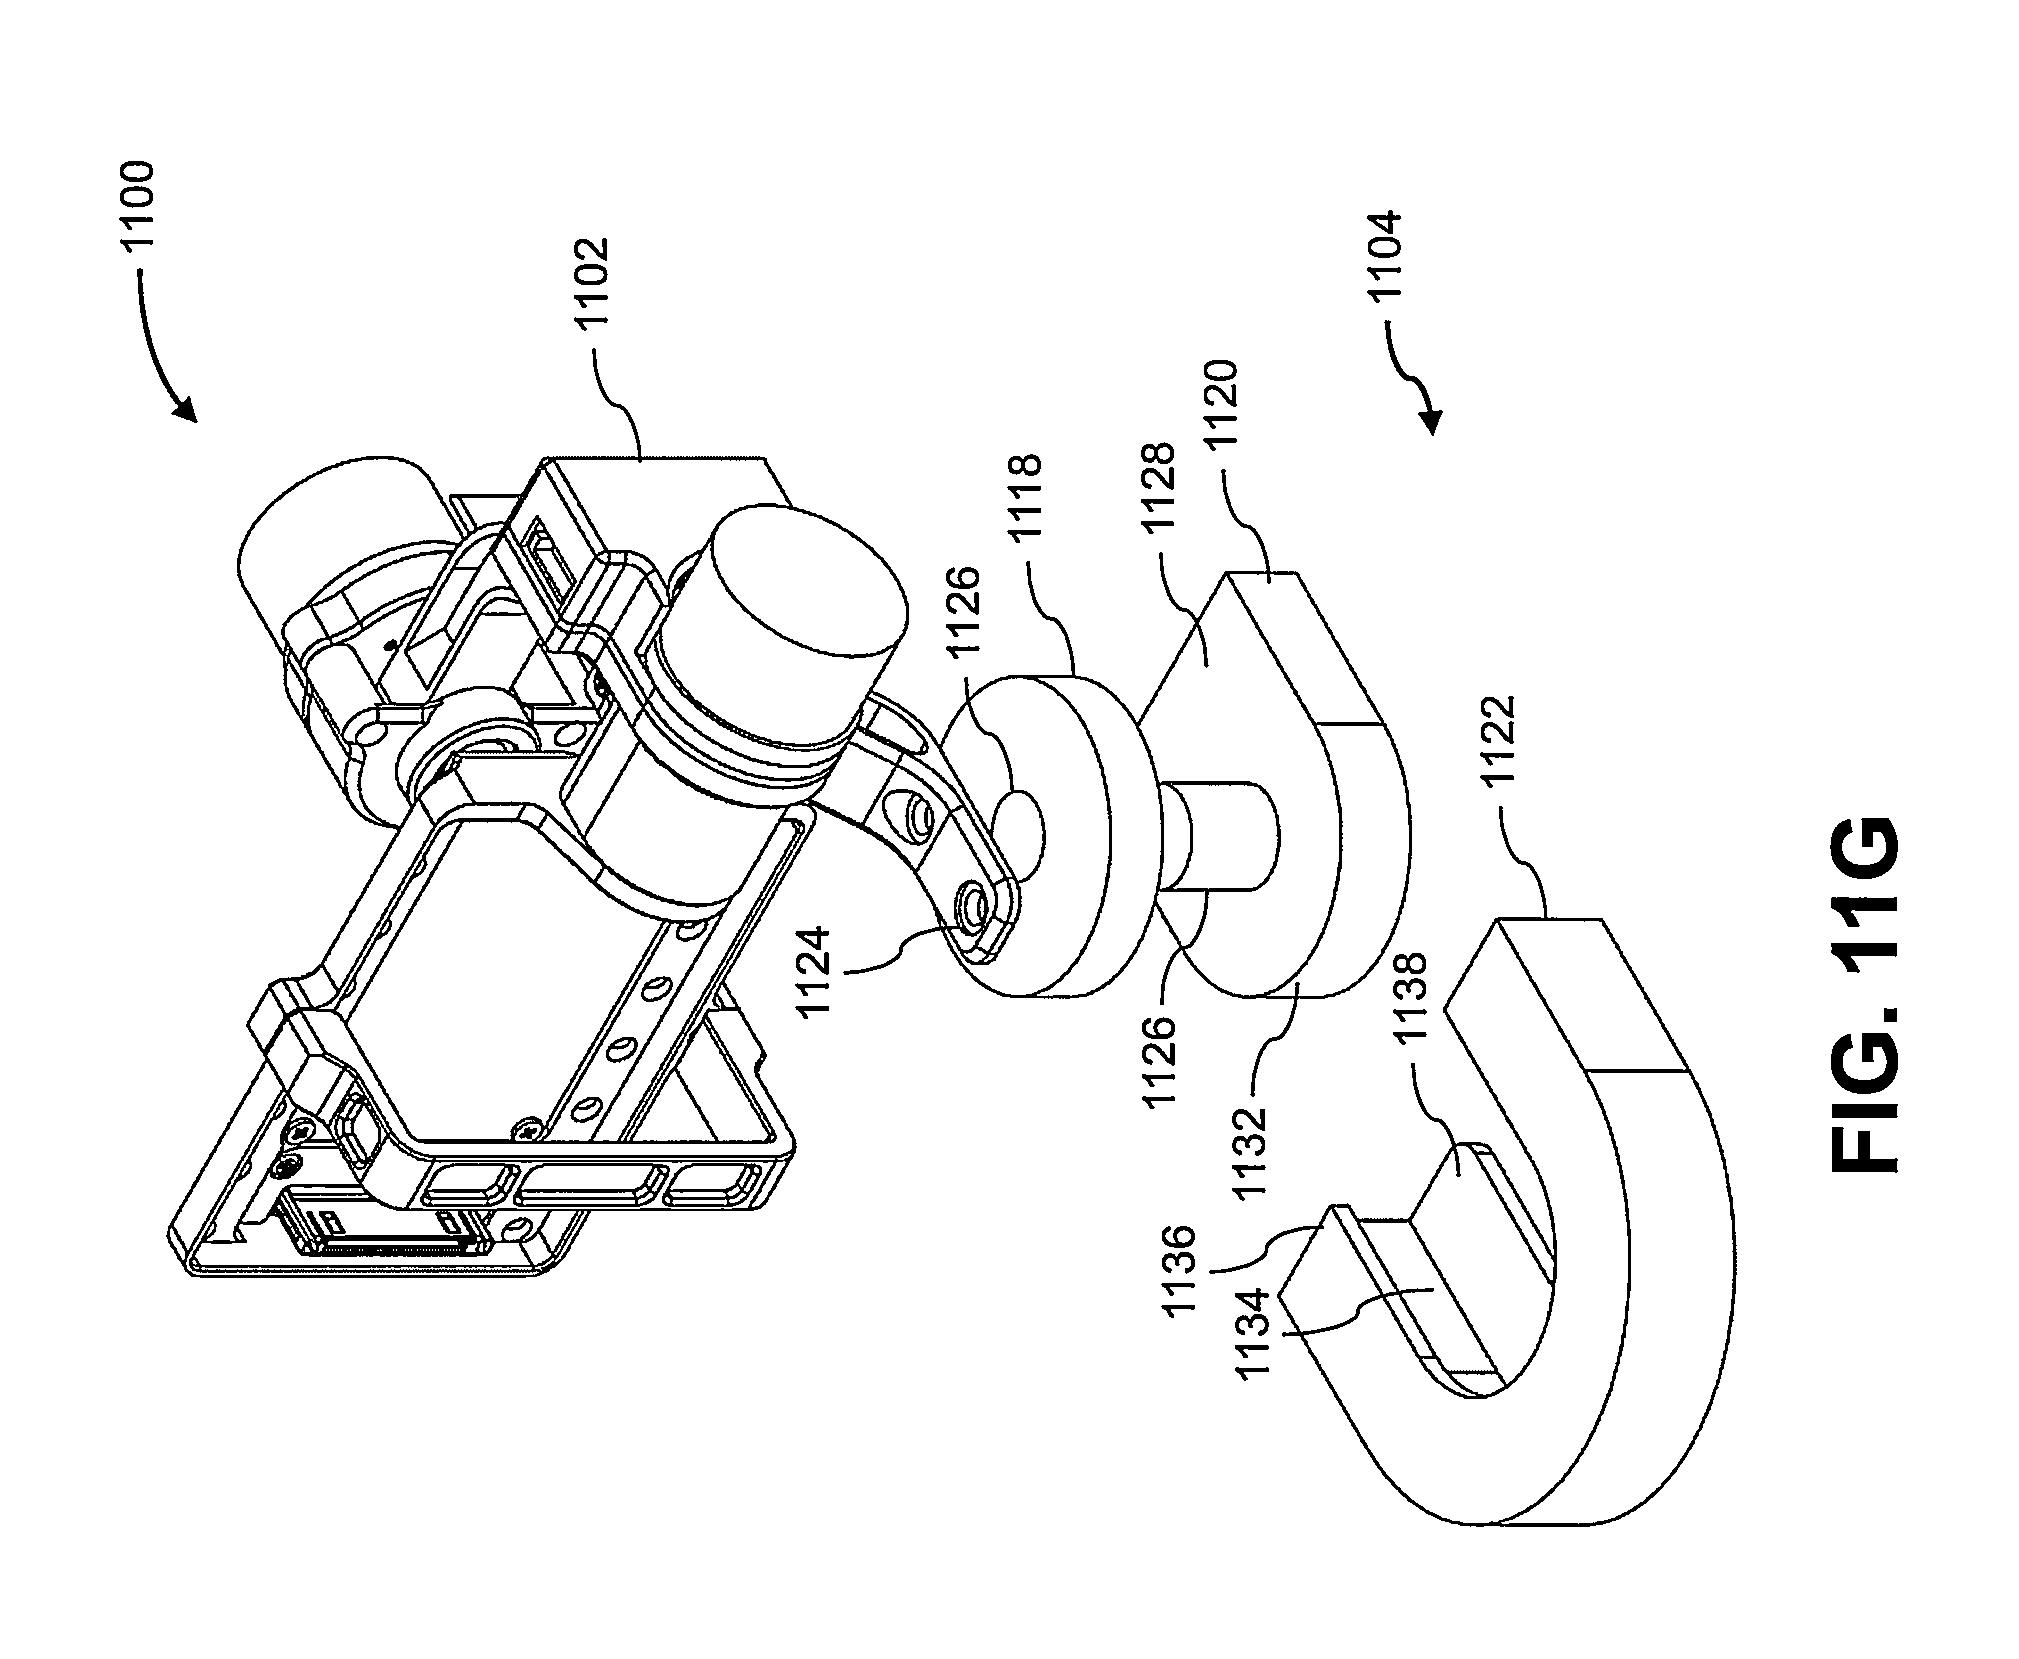 2015 tao tao 50cc engine diagram wiring diagram database Tao Tao CY50-T3 patent us 9 280 038 b1 tao tao engine wire diagram diagram 2015 tao tao 50cc engine diagram